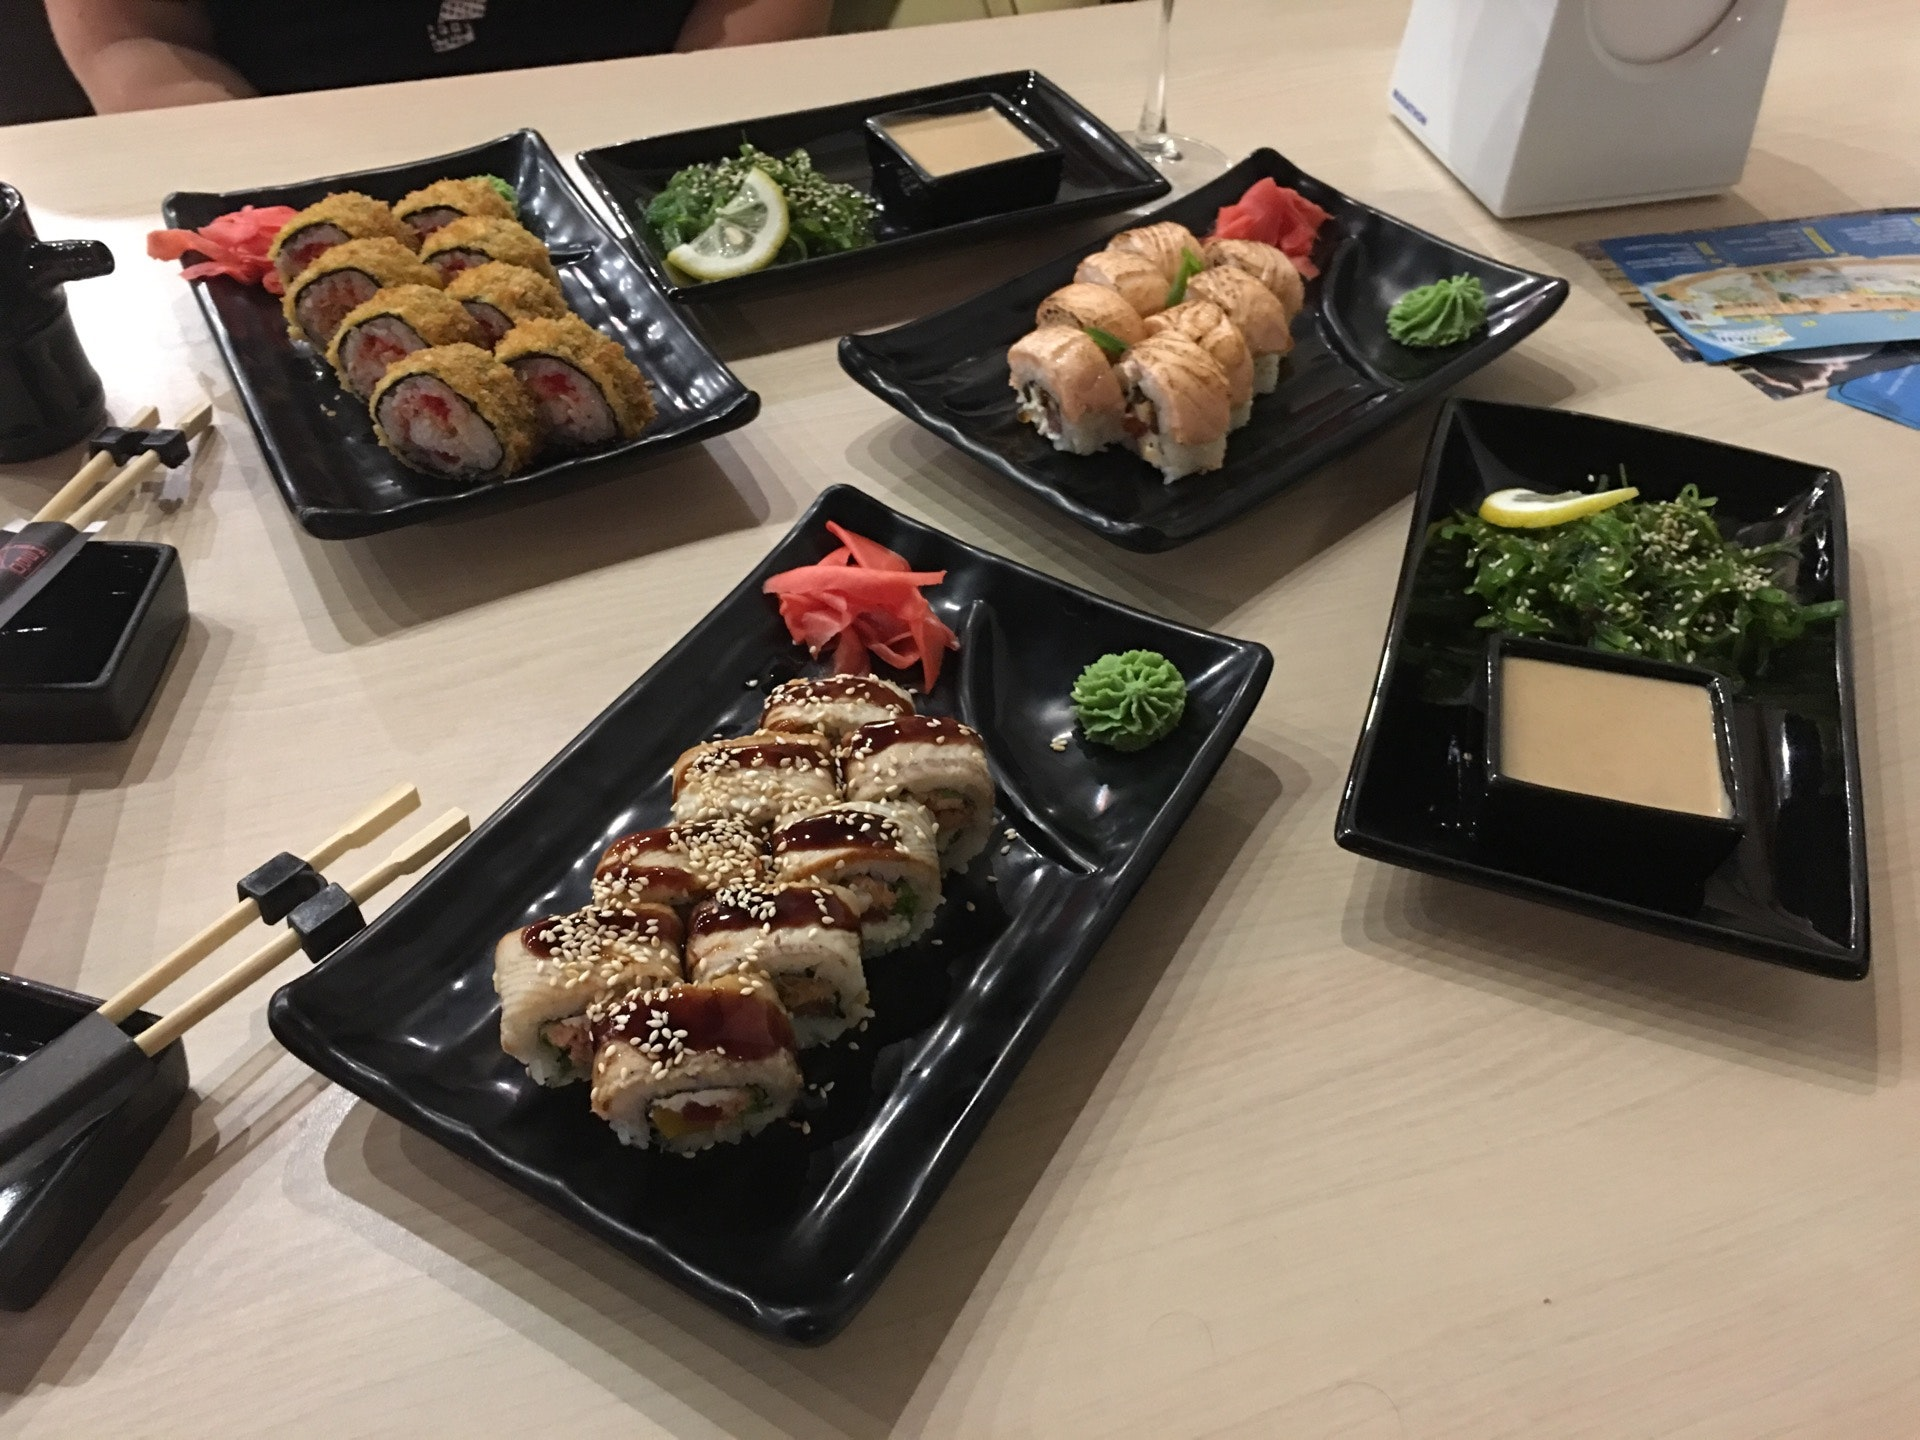 фото кухни суши на вынос недоверчивые